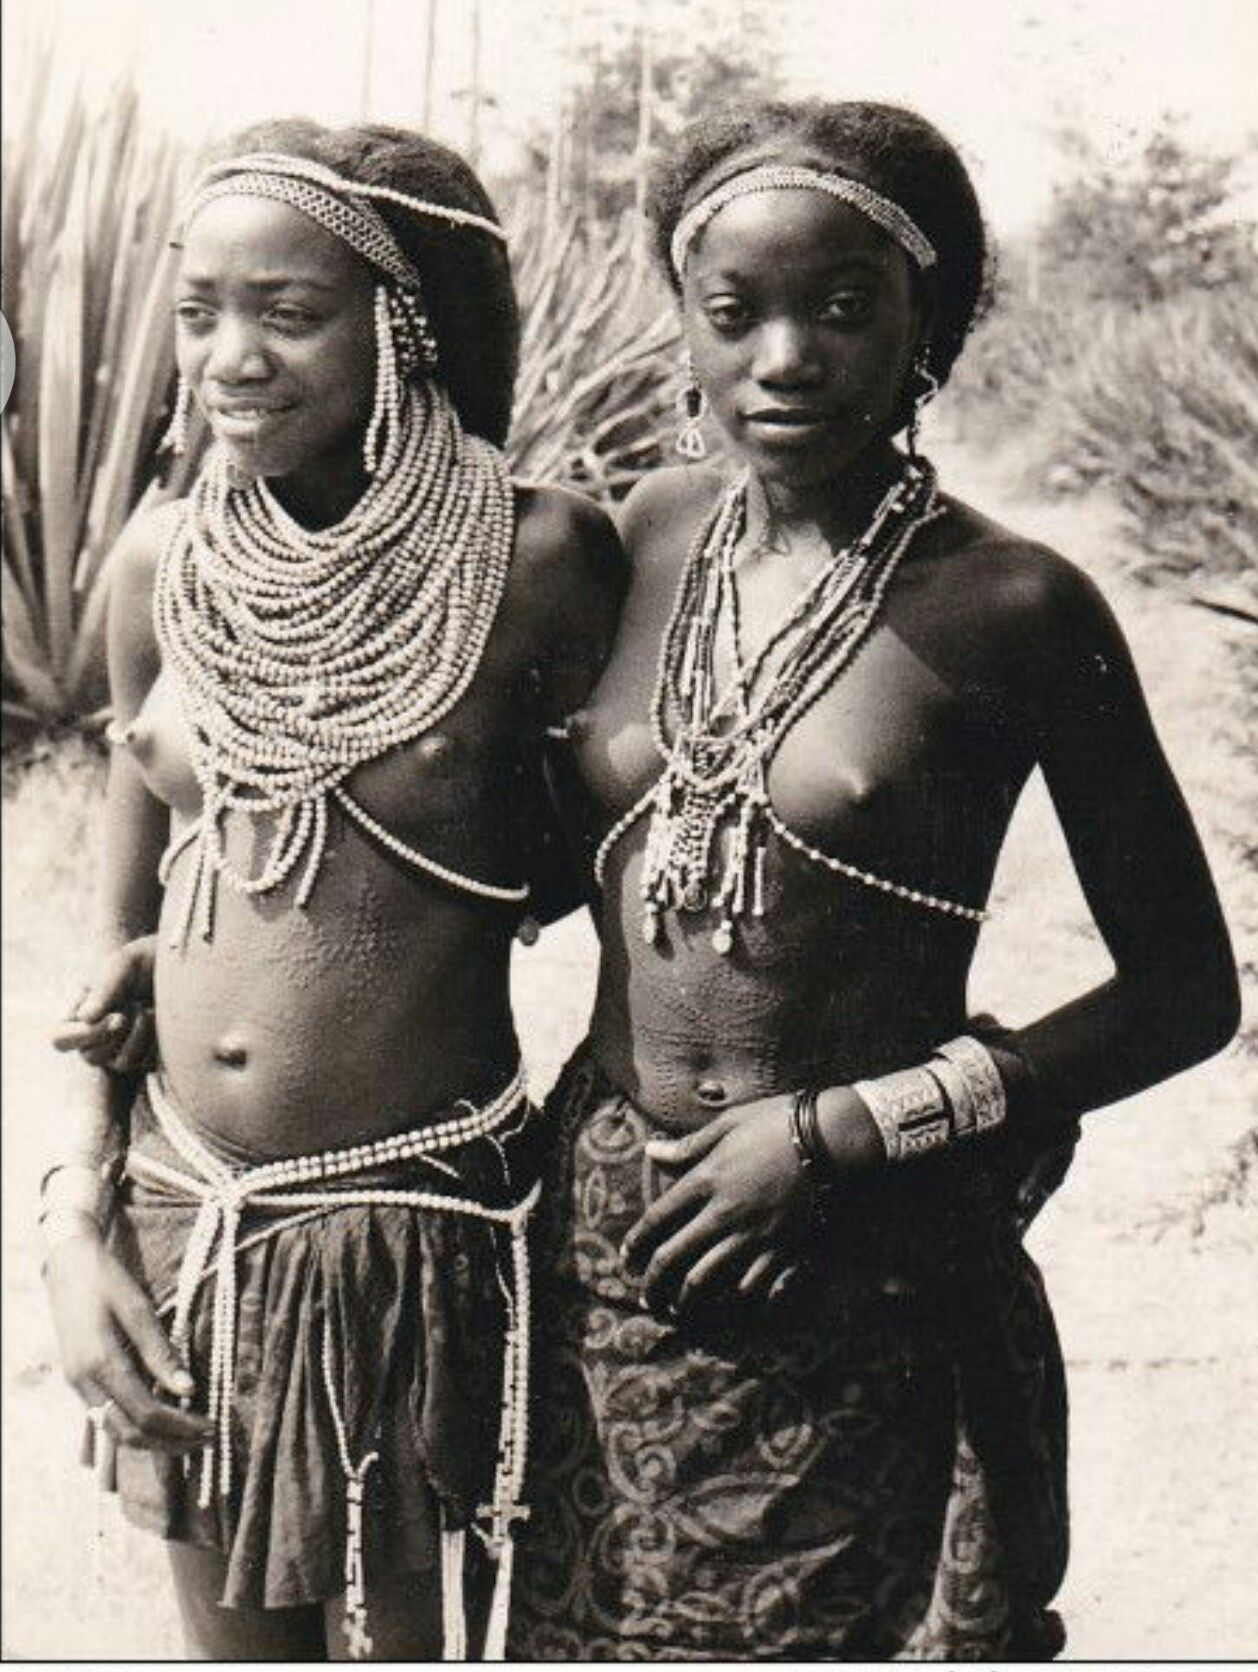 umbundu girls, angola 1920's   angola, luanda   native girls